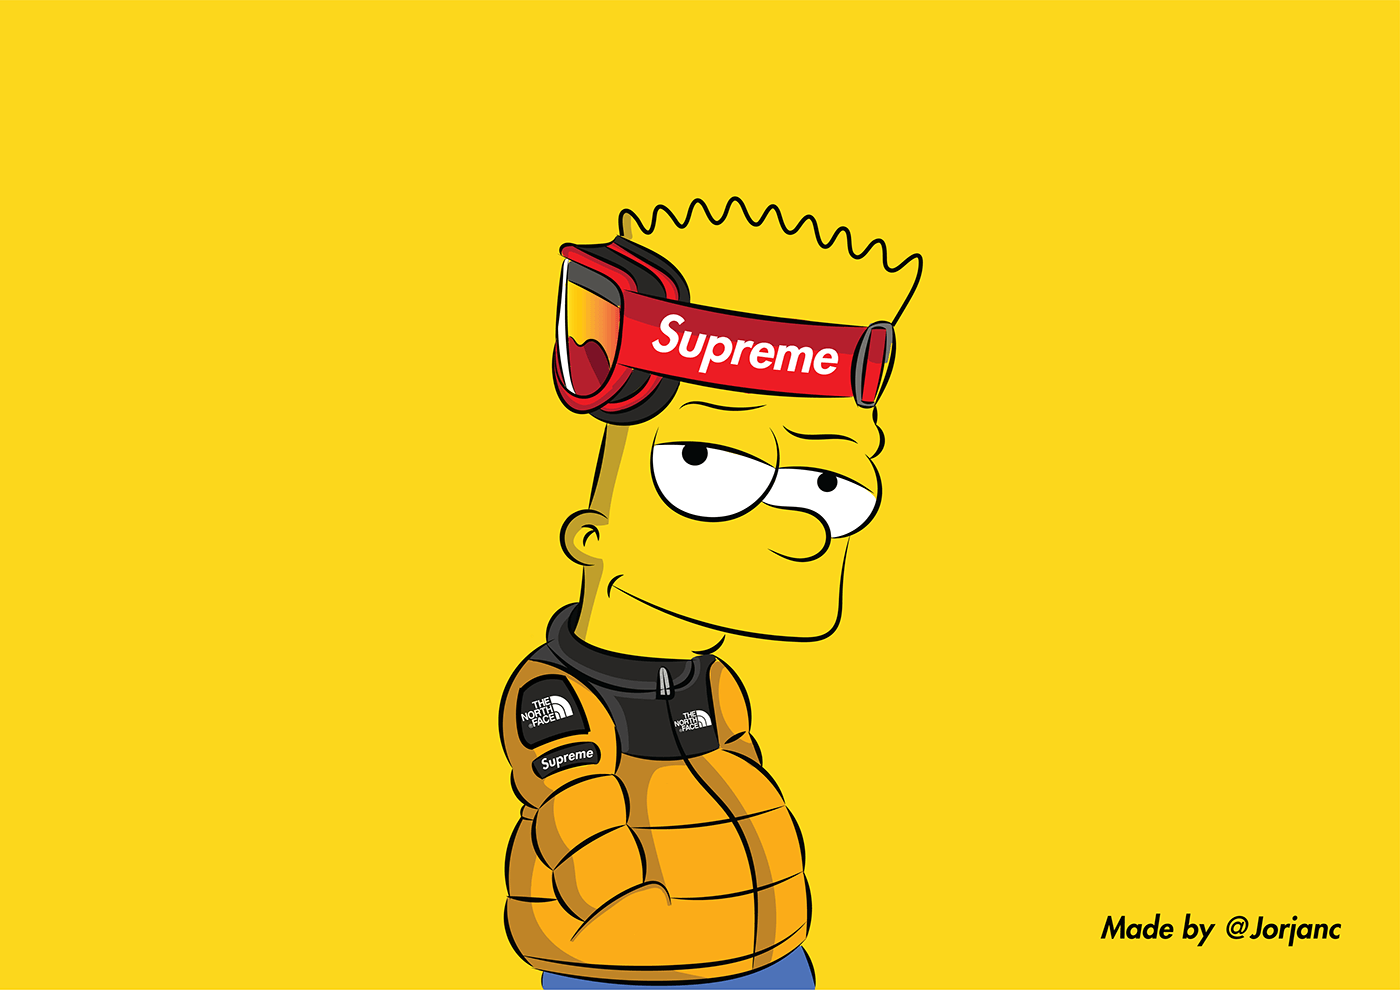 High Bart Simpson Supreme Wallpapers Top Free High Bart